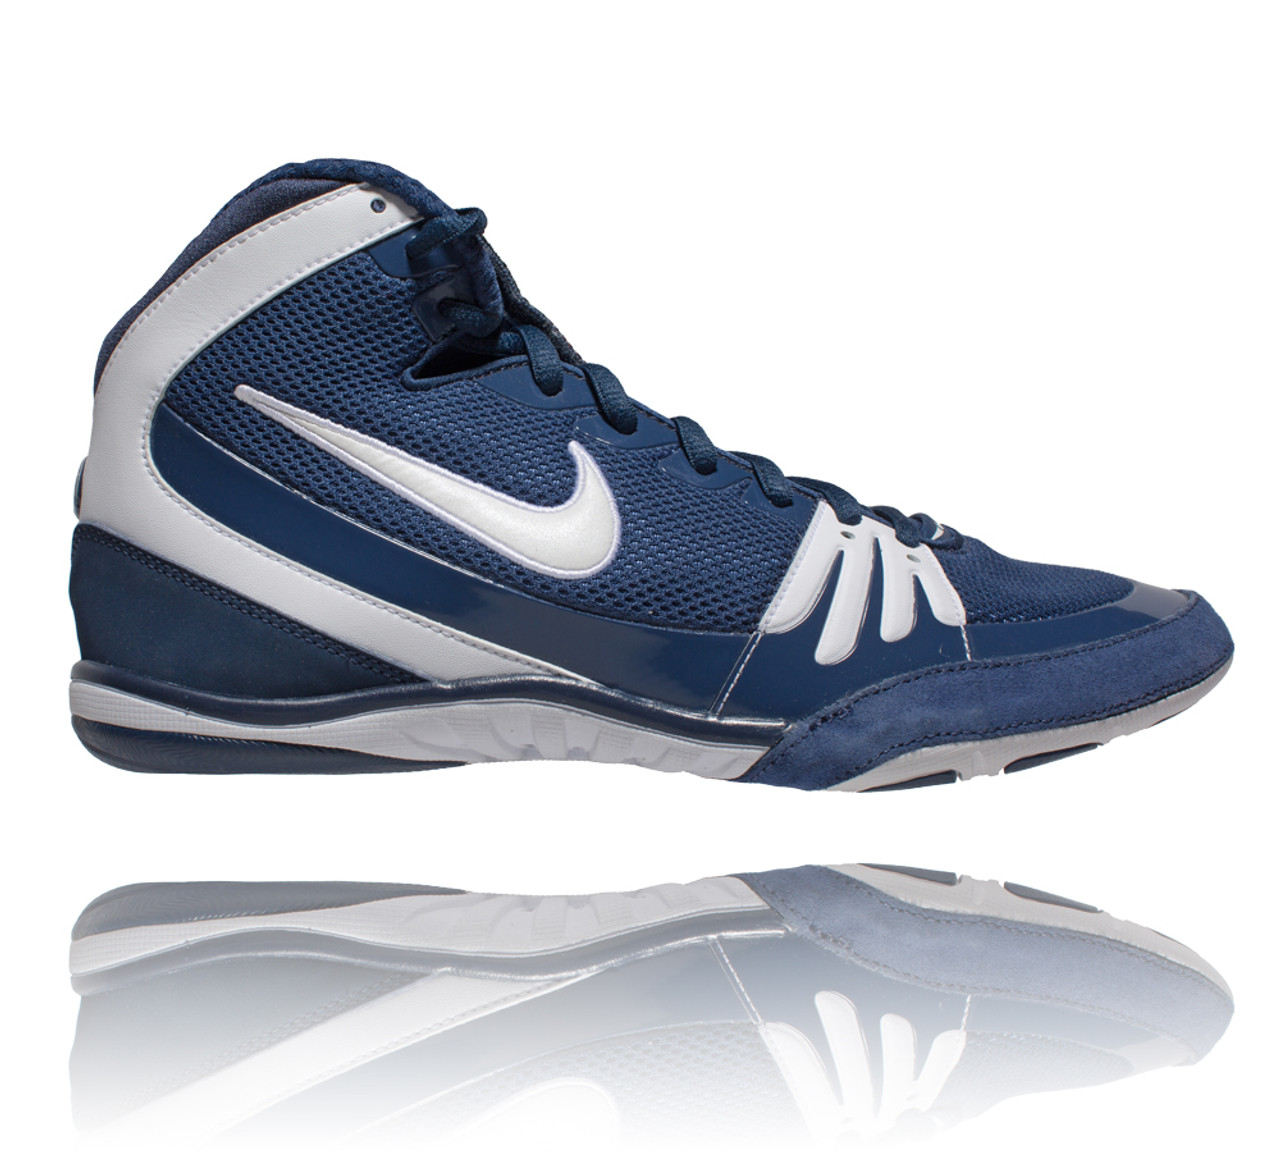 Nike Freek Navy / White